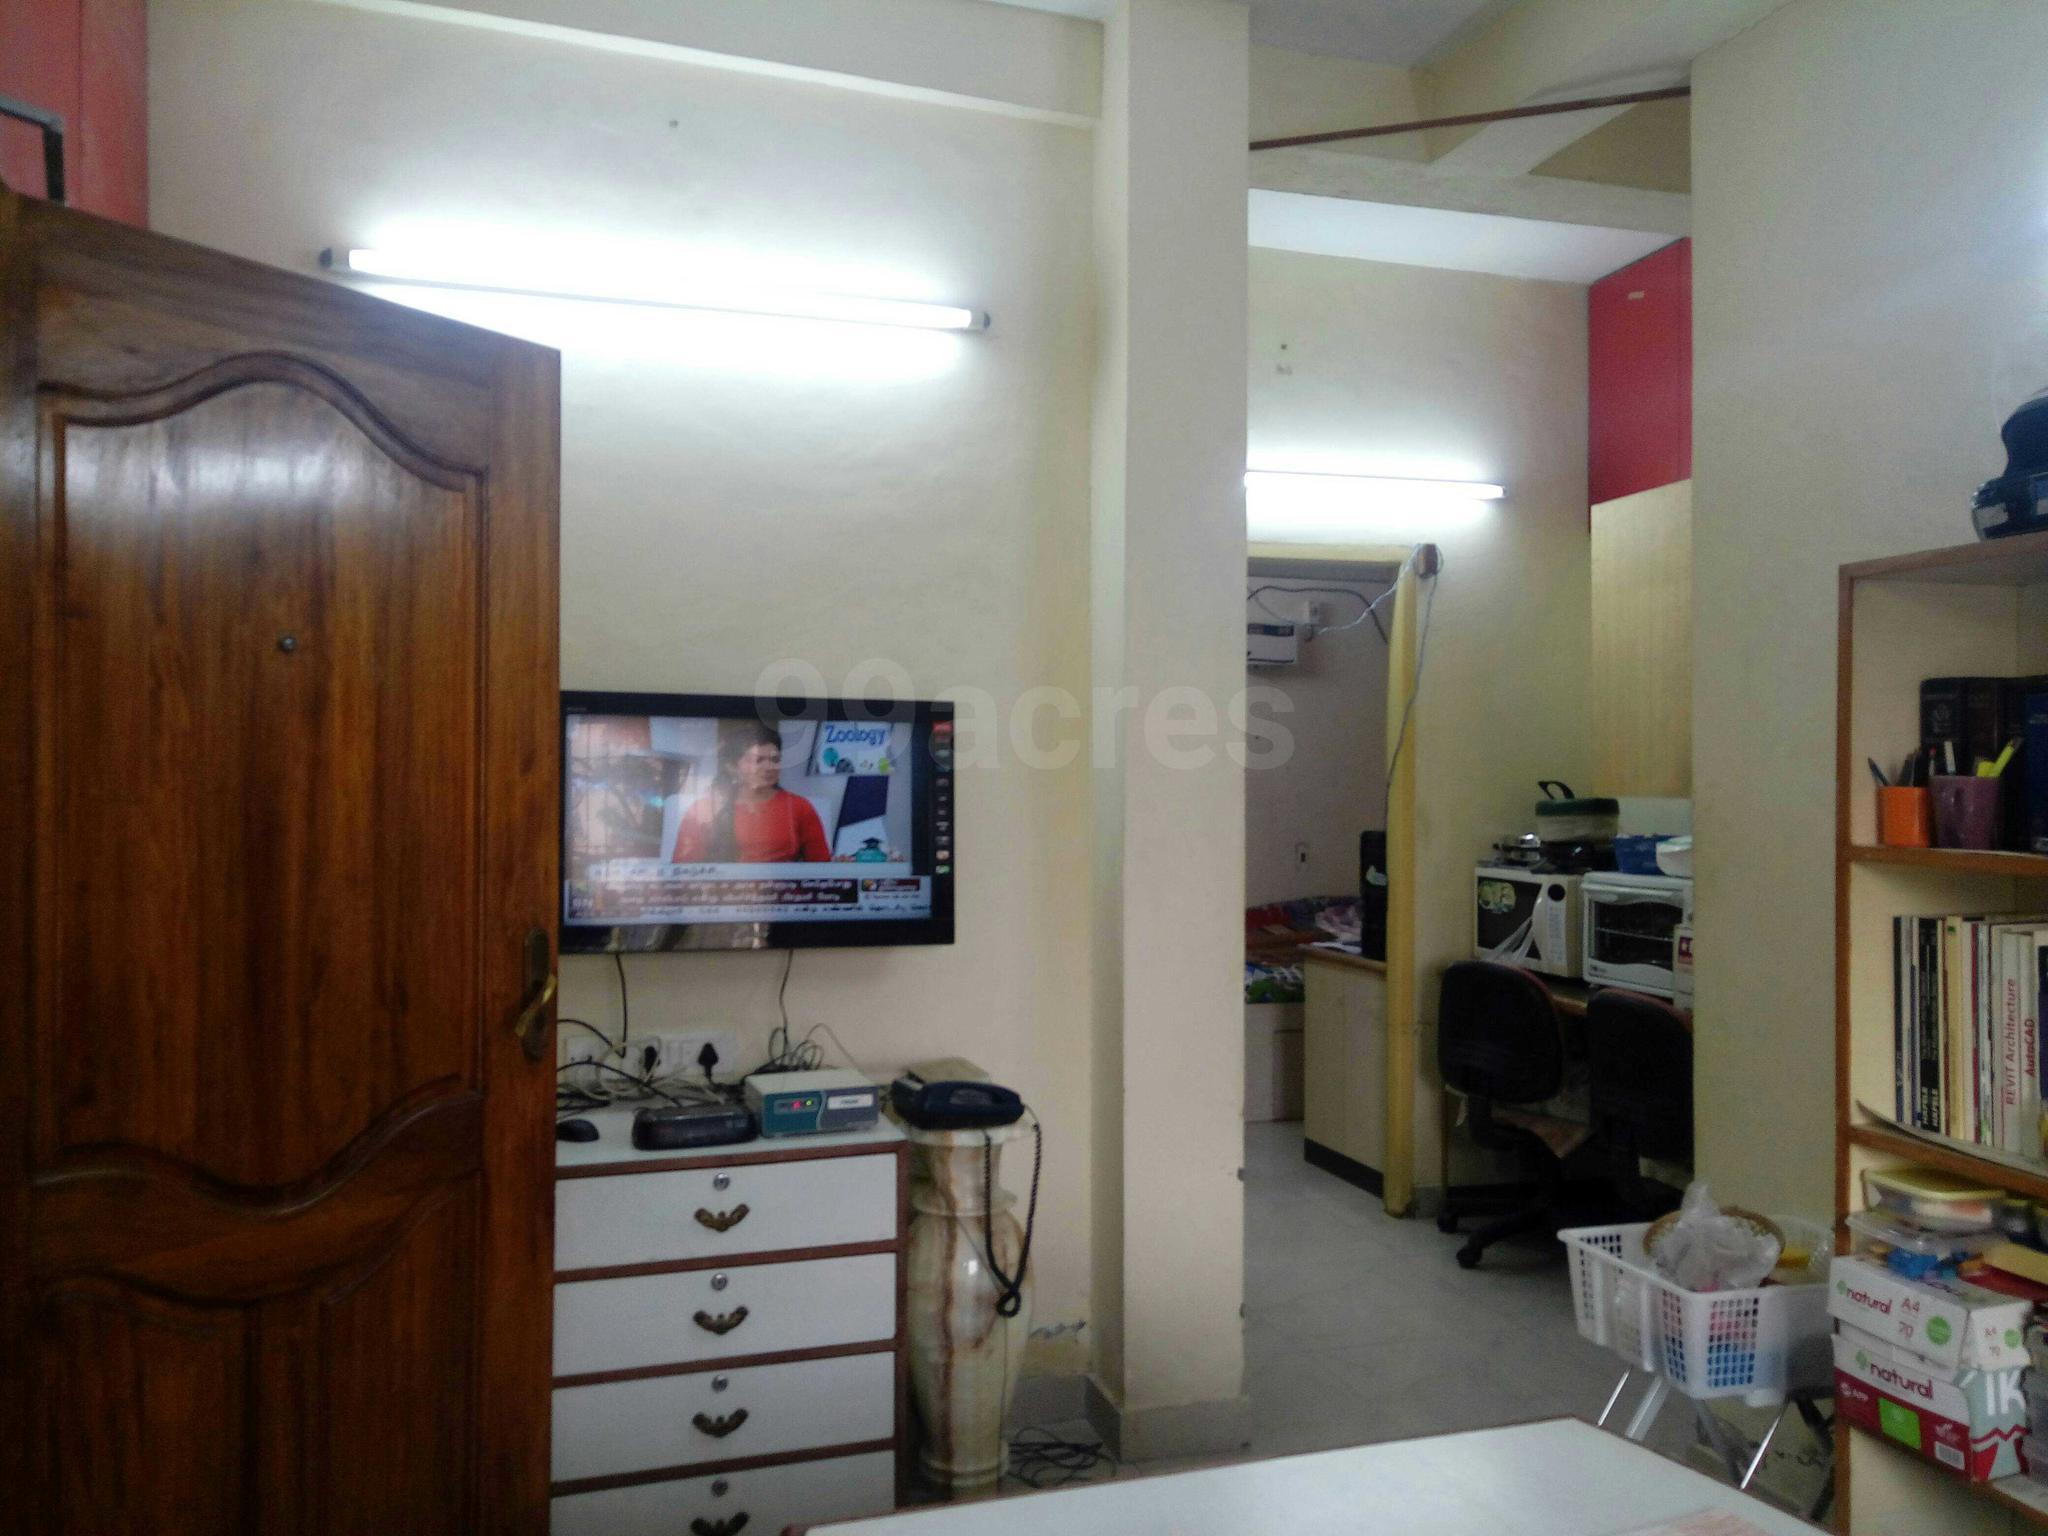 1560423773_banner_shenoy_1.jpeg